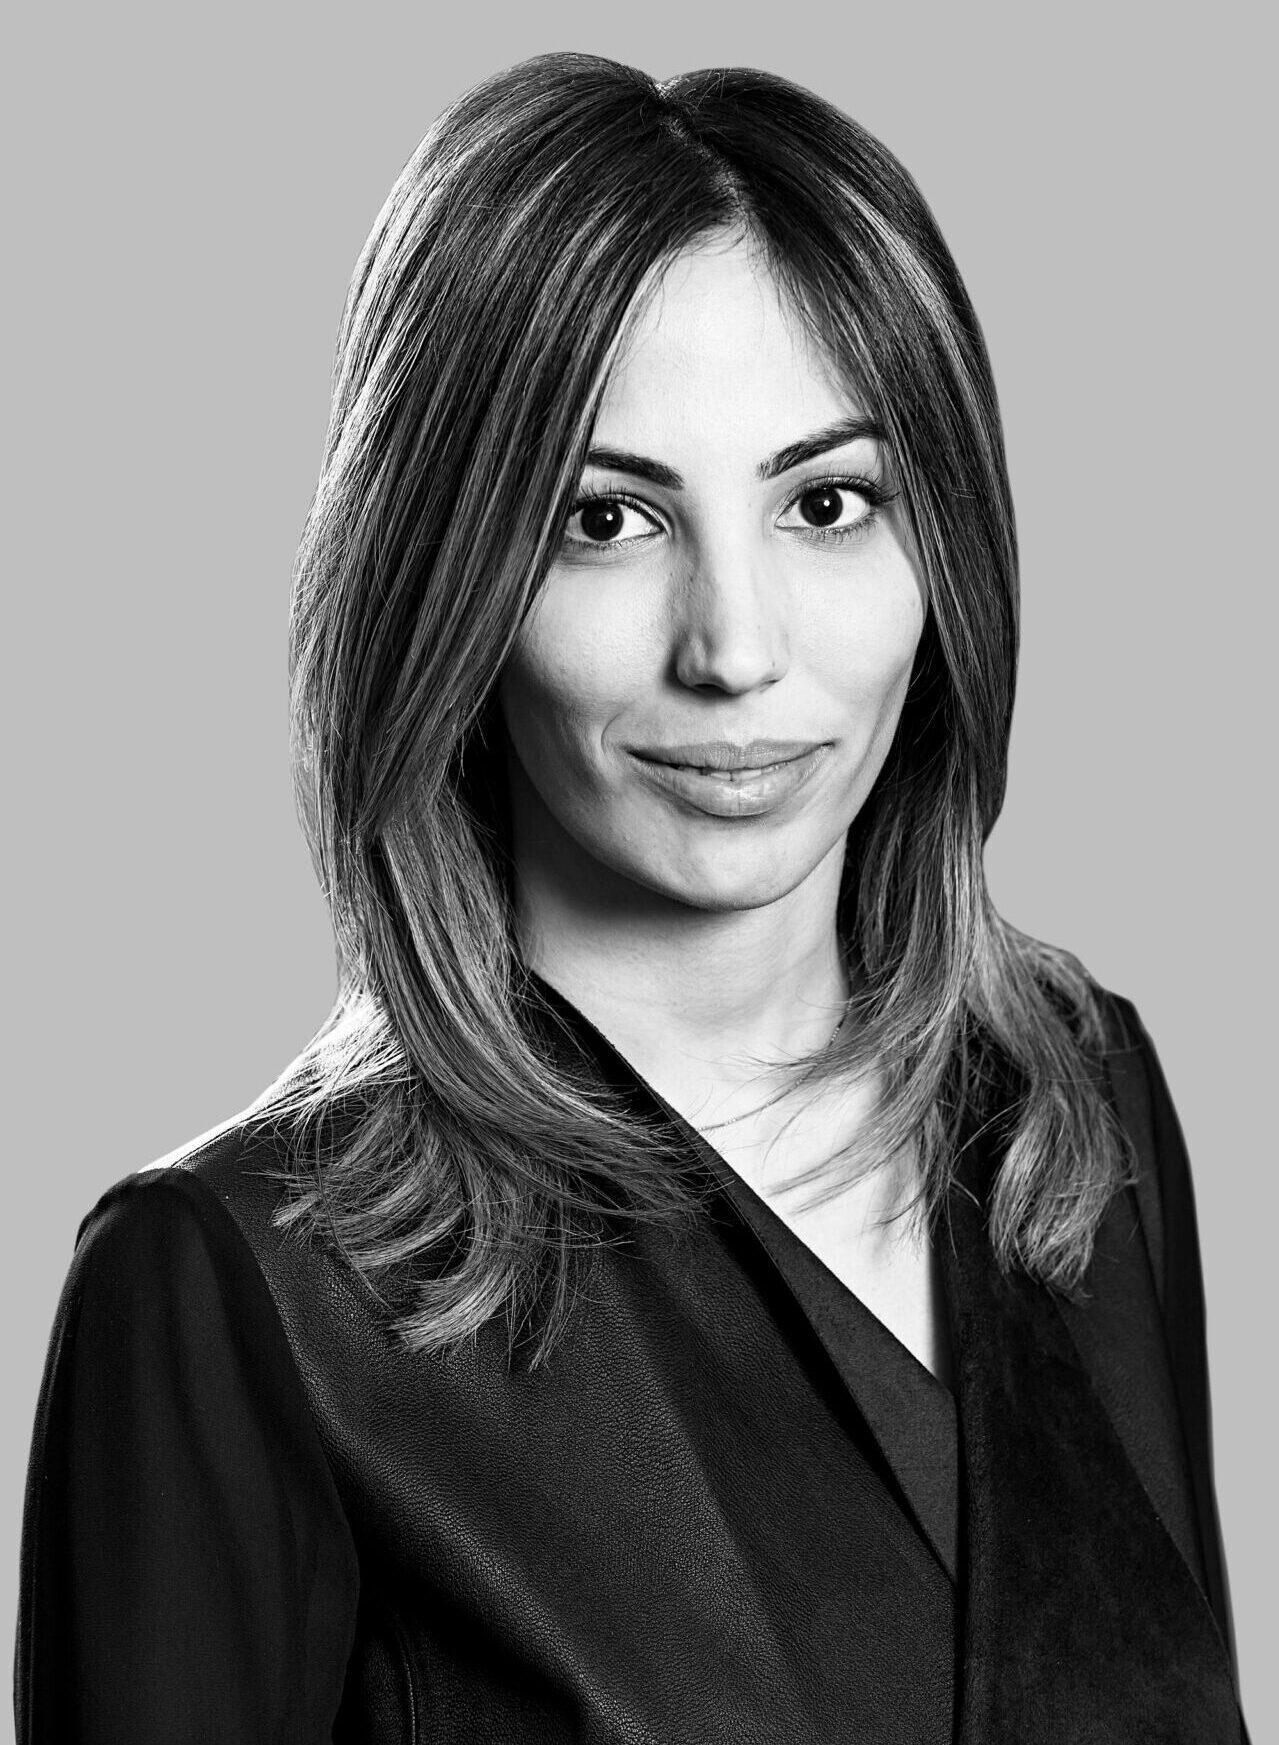 Mariam Ghoul